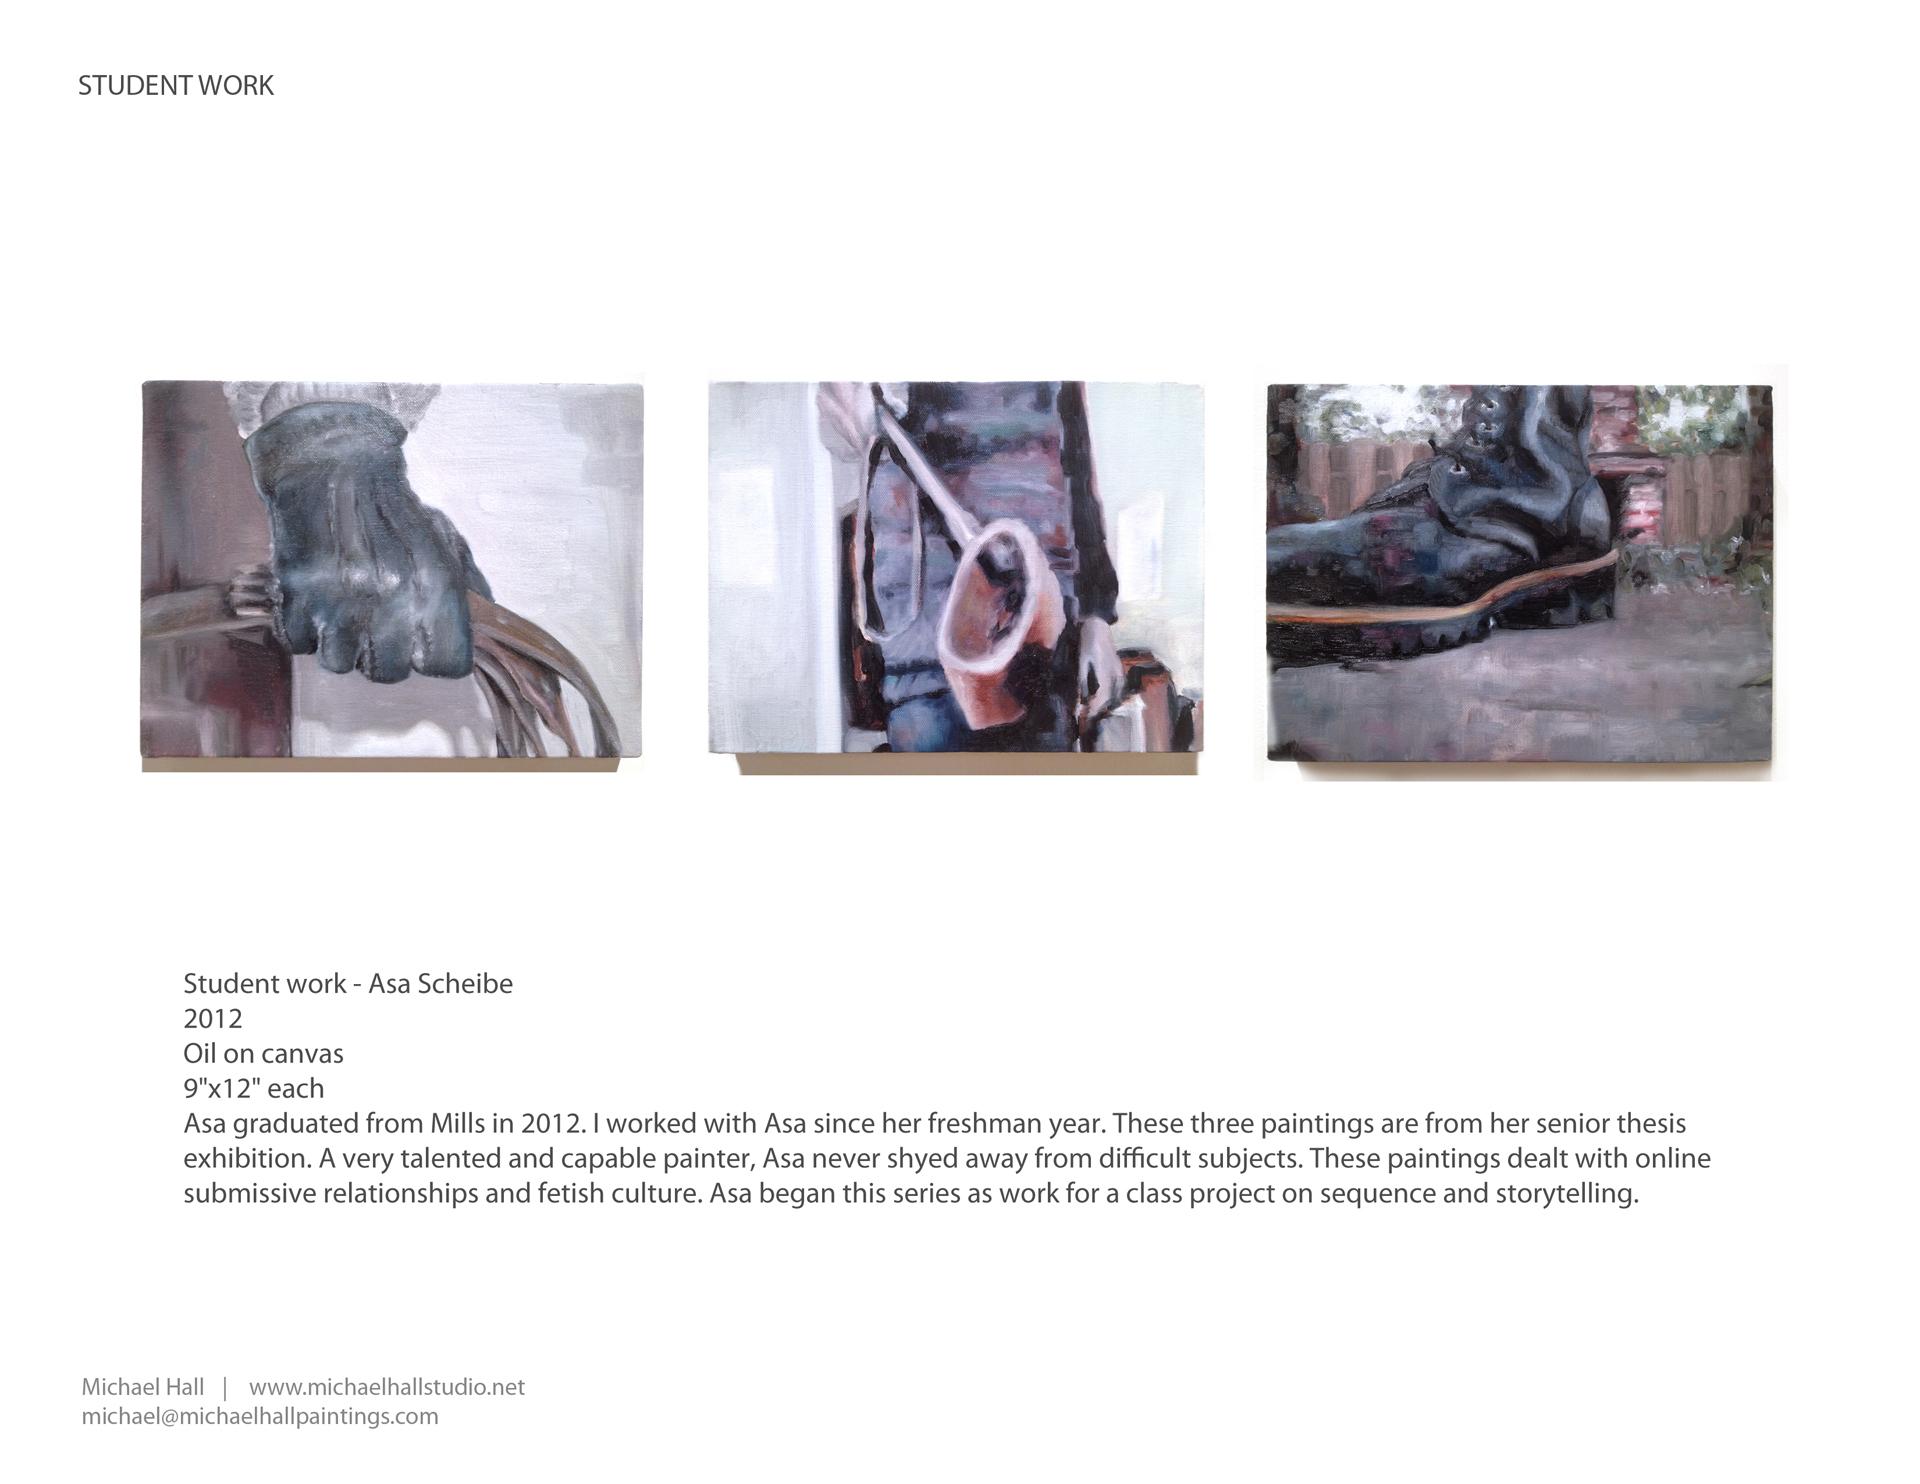 5. Student_work_Asa Scheibe .jpg